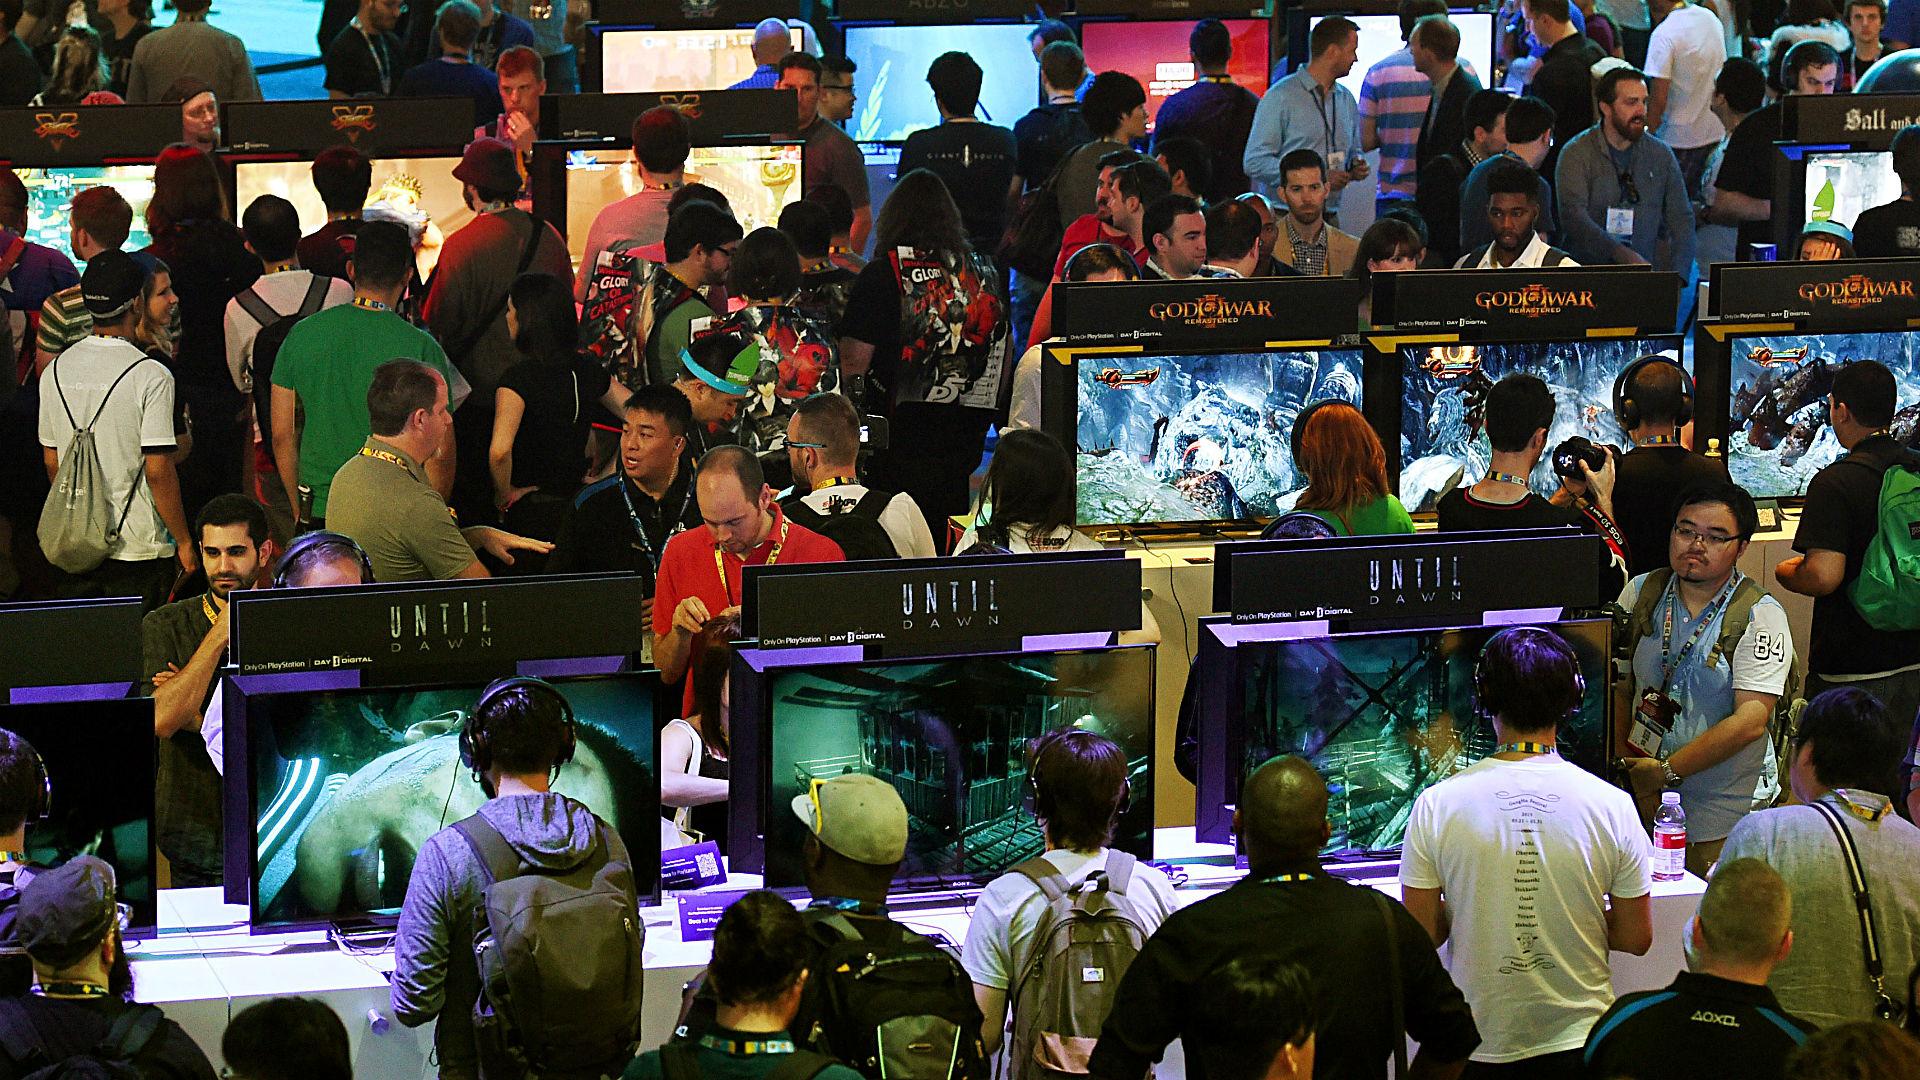 Gamers-screen-072415-Getty-FTR.jpg